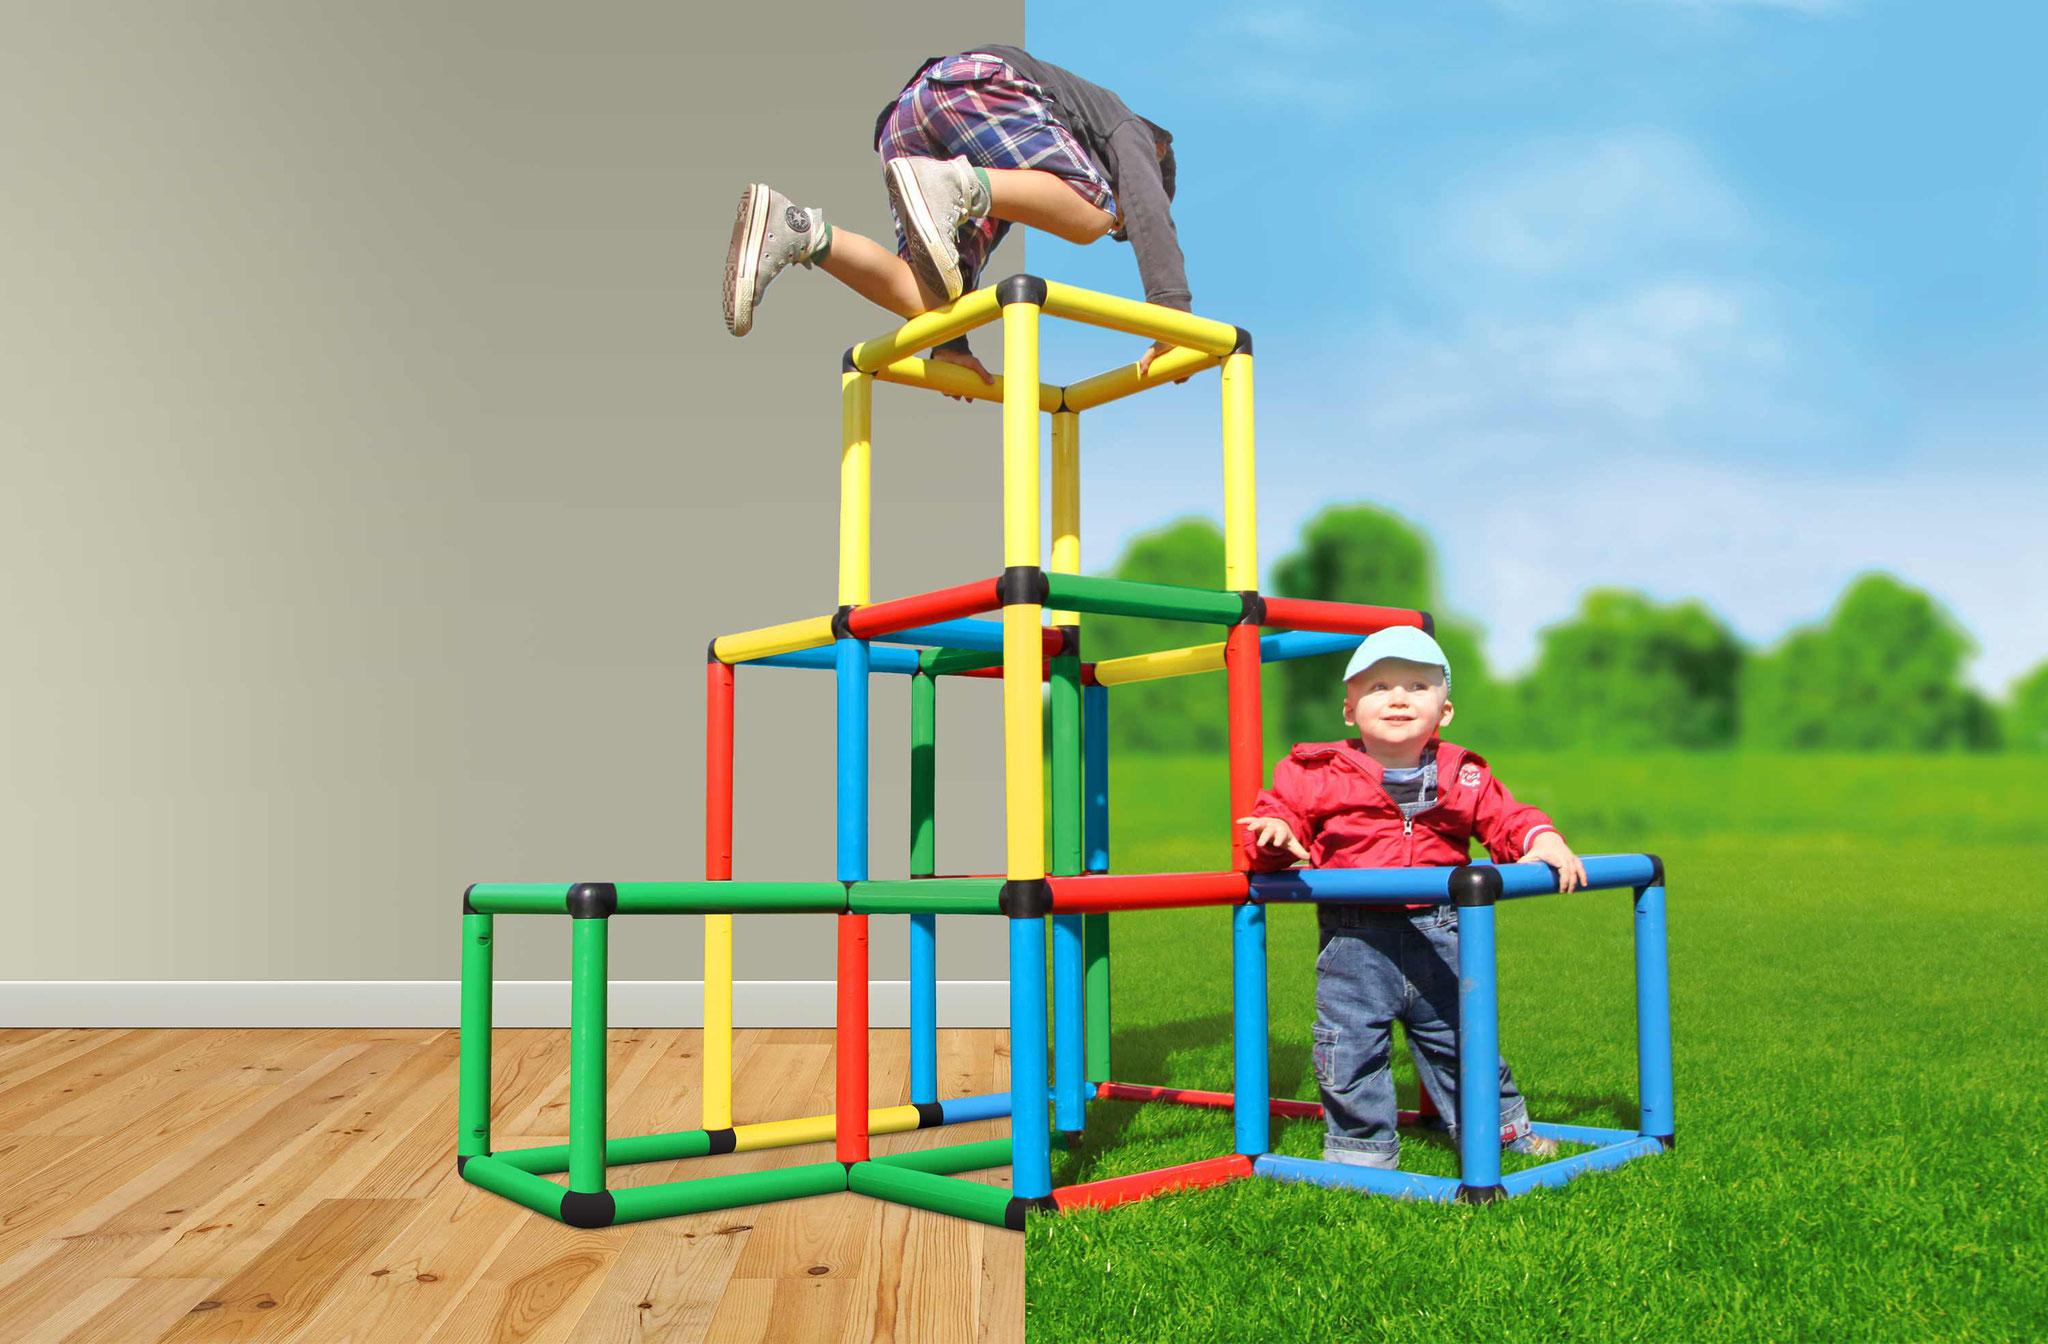 Quadro Klettergerüst Universal : Kletterpyramide quadro der grossbaukasten